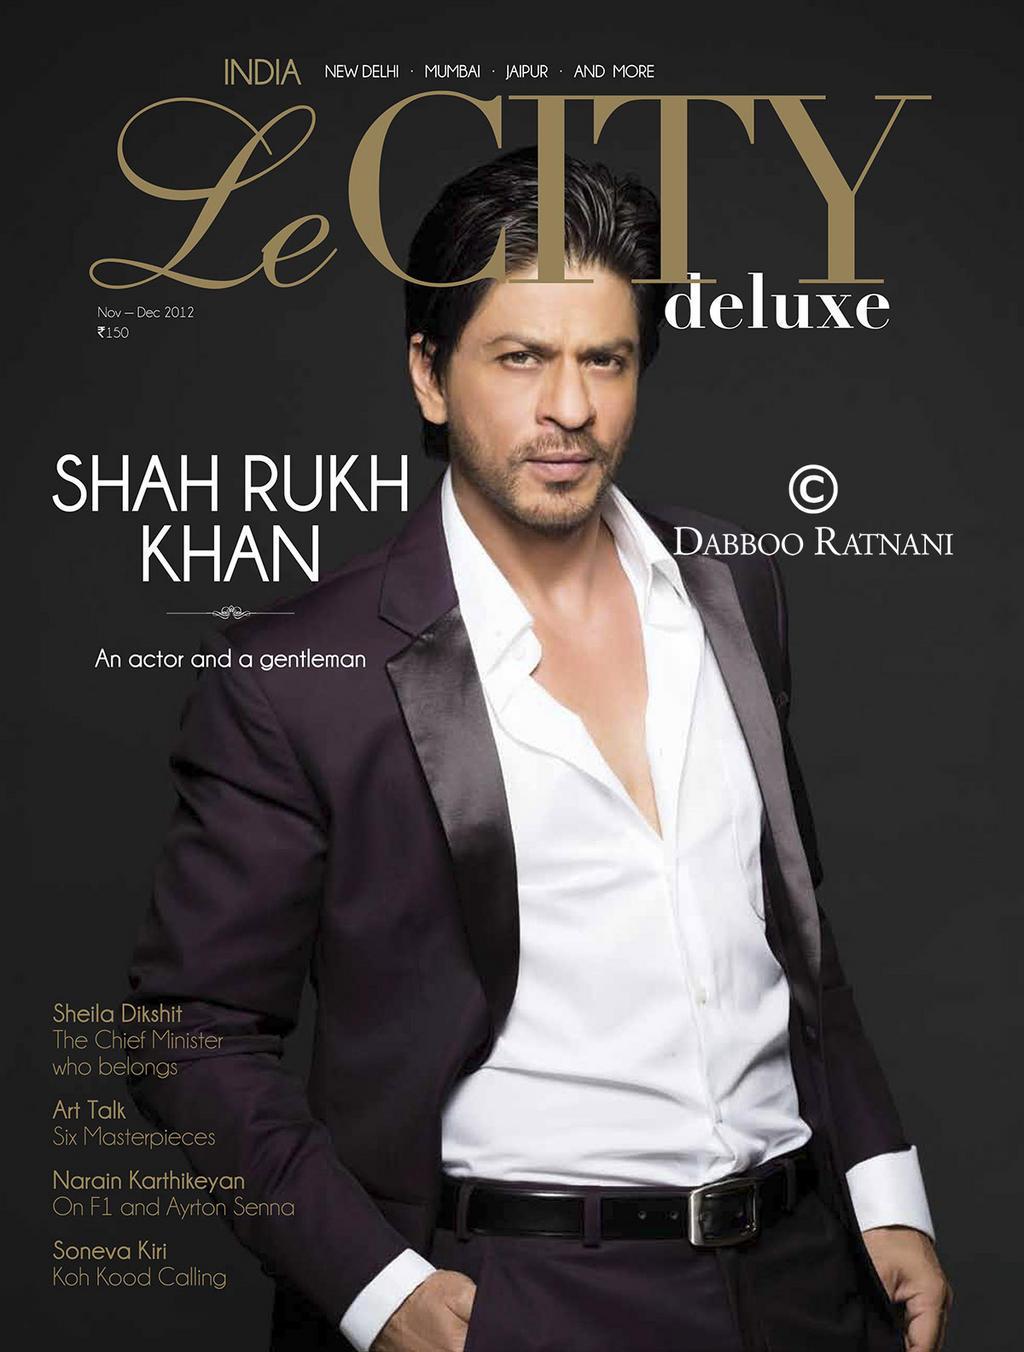 Bollywoodské časopisy - Stránka 23 Tumblr_mee7yurUbg1rrzhzmo1_1280